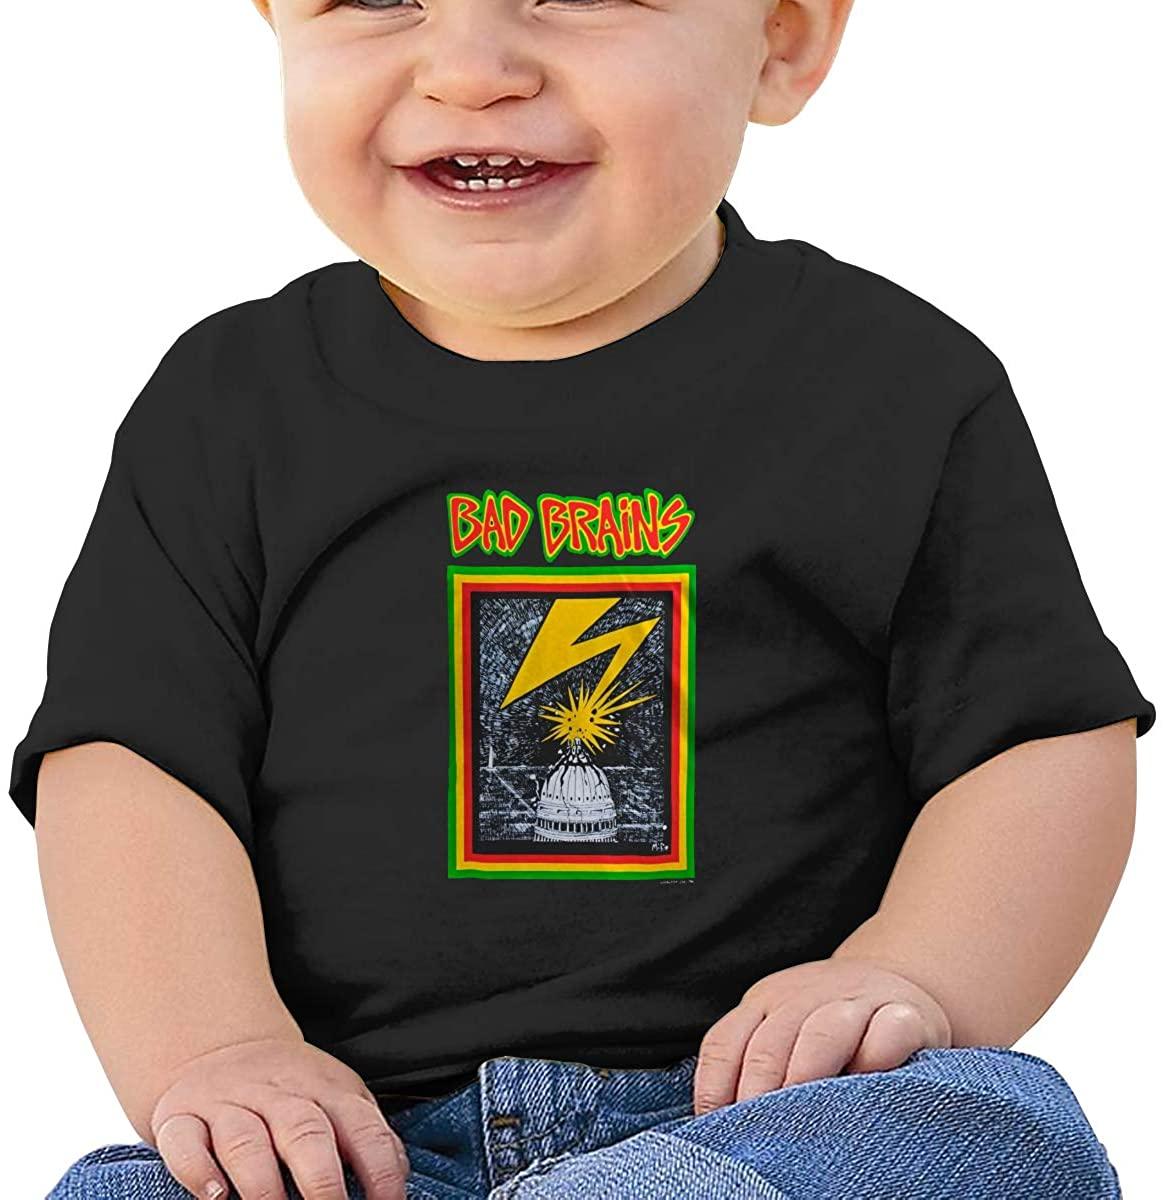 Fgrtyt Baby Bad Brains Short Sleeve Cotton Graphic Tee T-Shirt